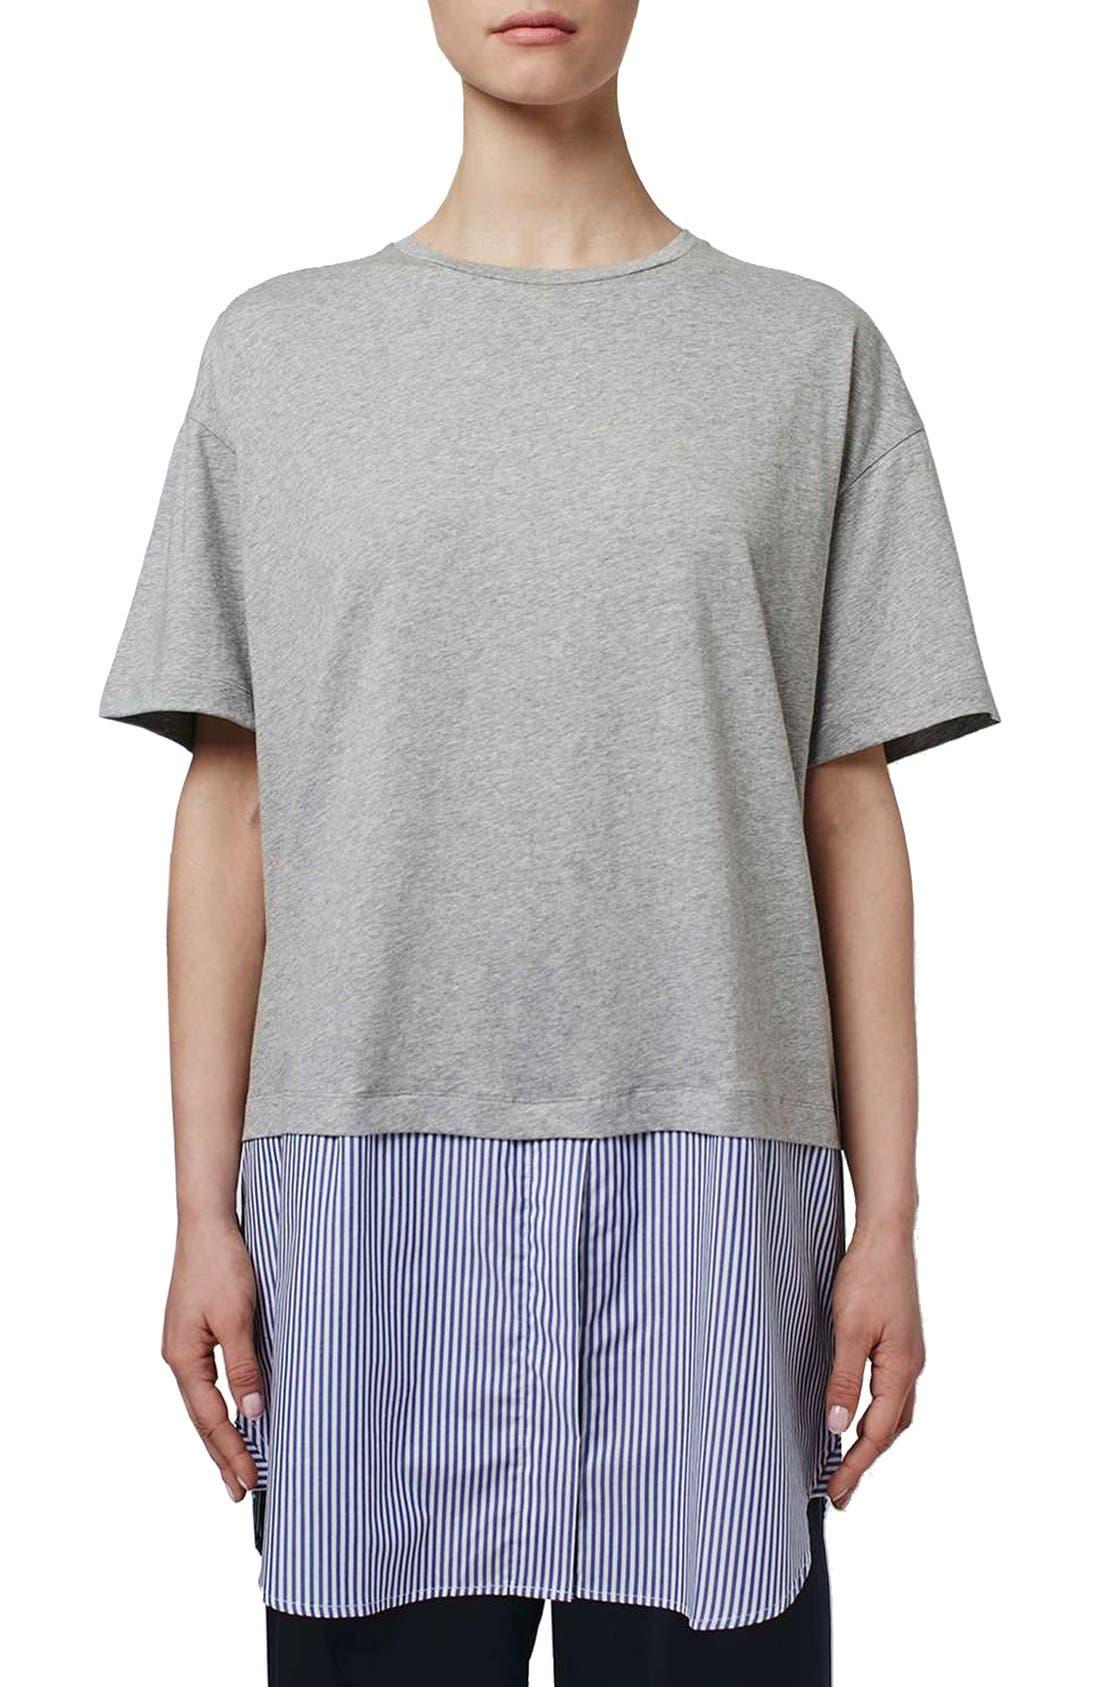 Alternate Image 1 Selected - Topshop Boutique Stripe Shirt Hem T-Shirt Dress